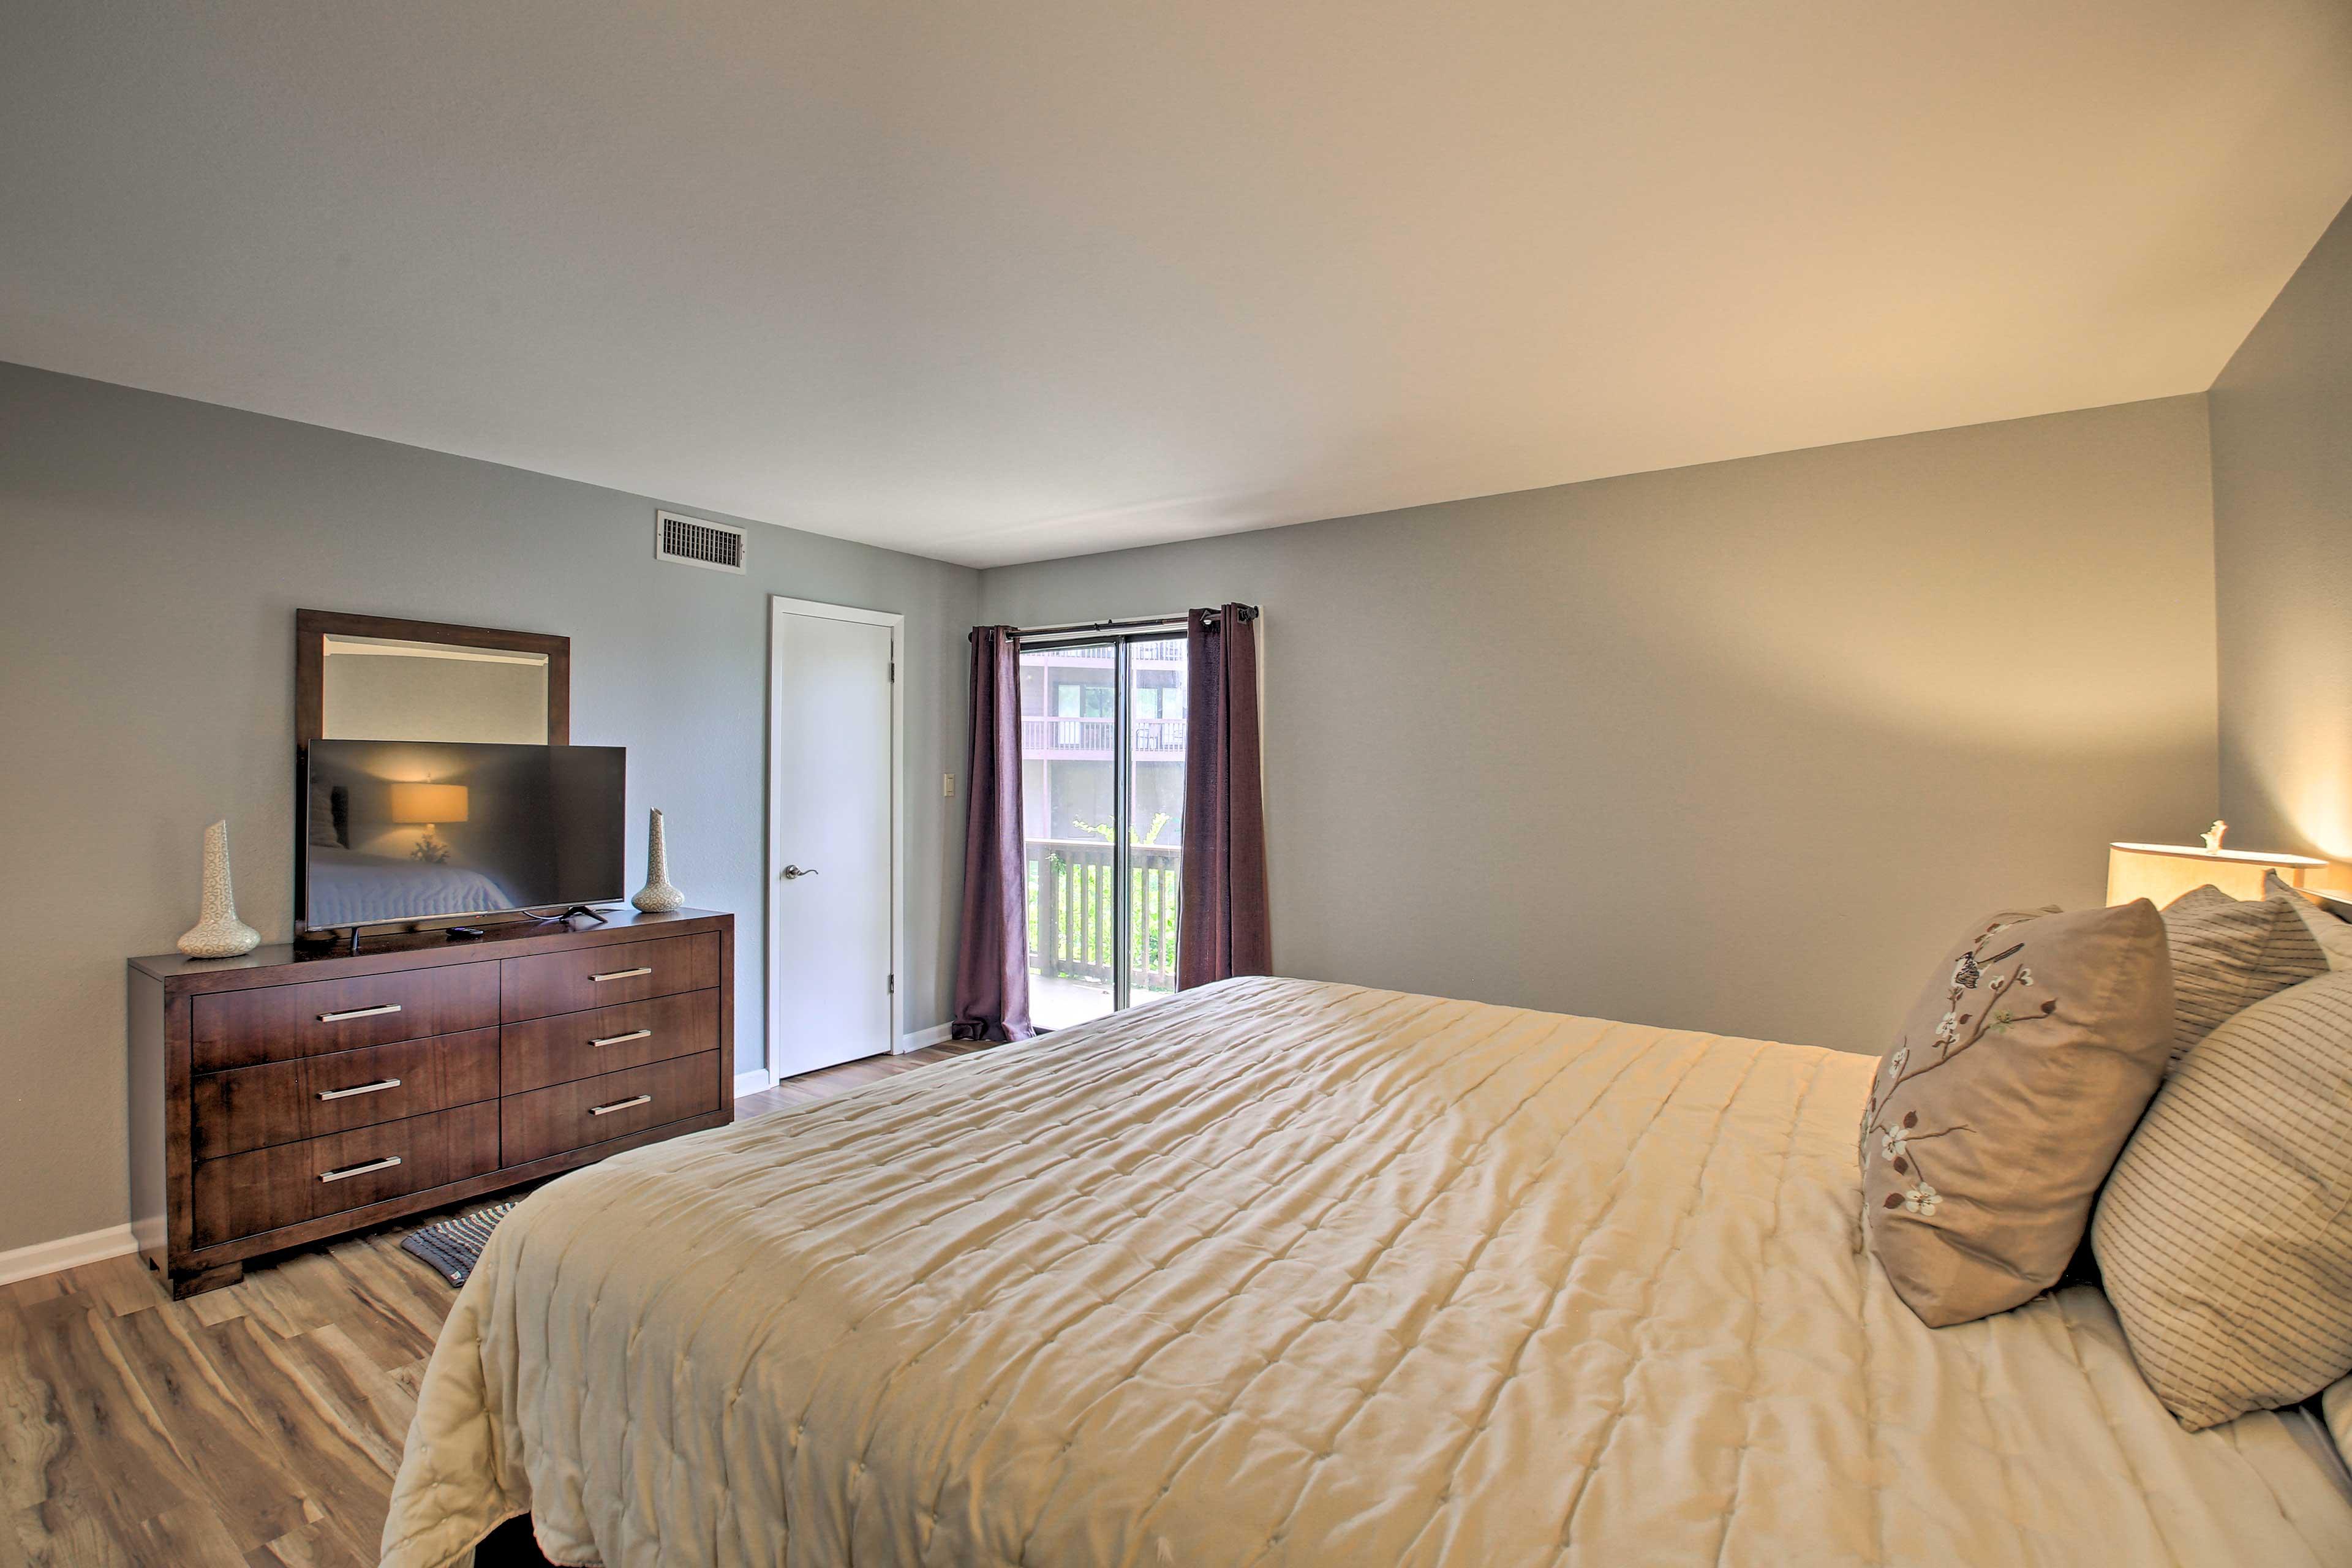 The master bedroom has a king bed, Smart TV, and en-suite bathroom.